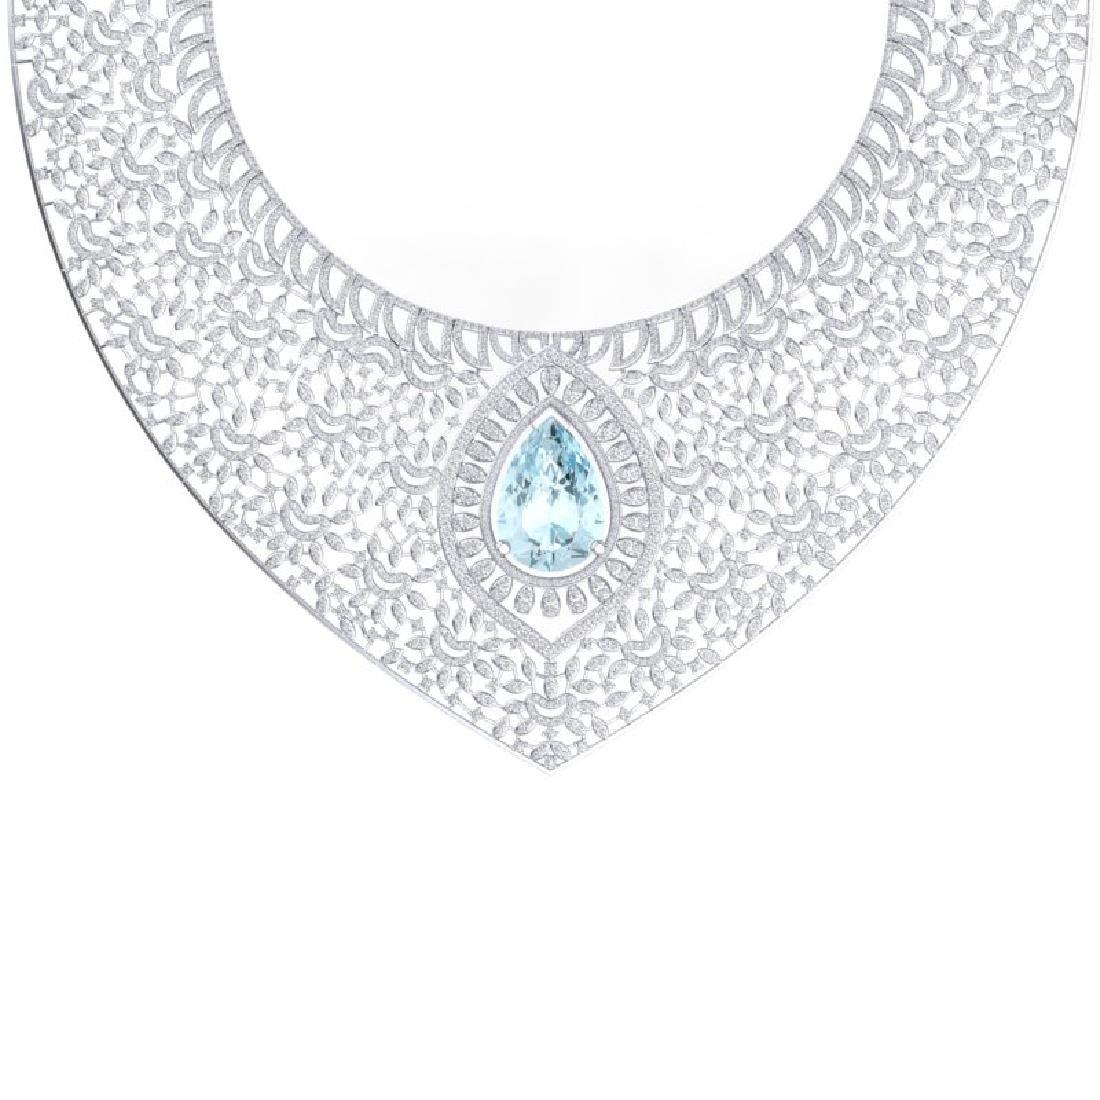 63.27 CTW Royalty Sky Topaz & VS Diamond Necklace 18K - 2